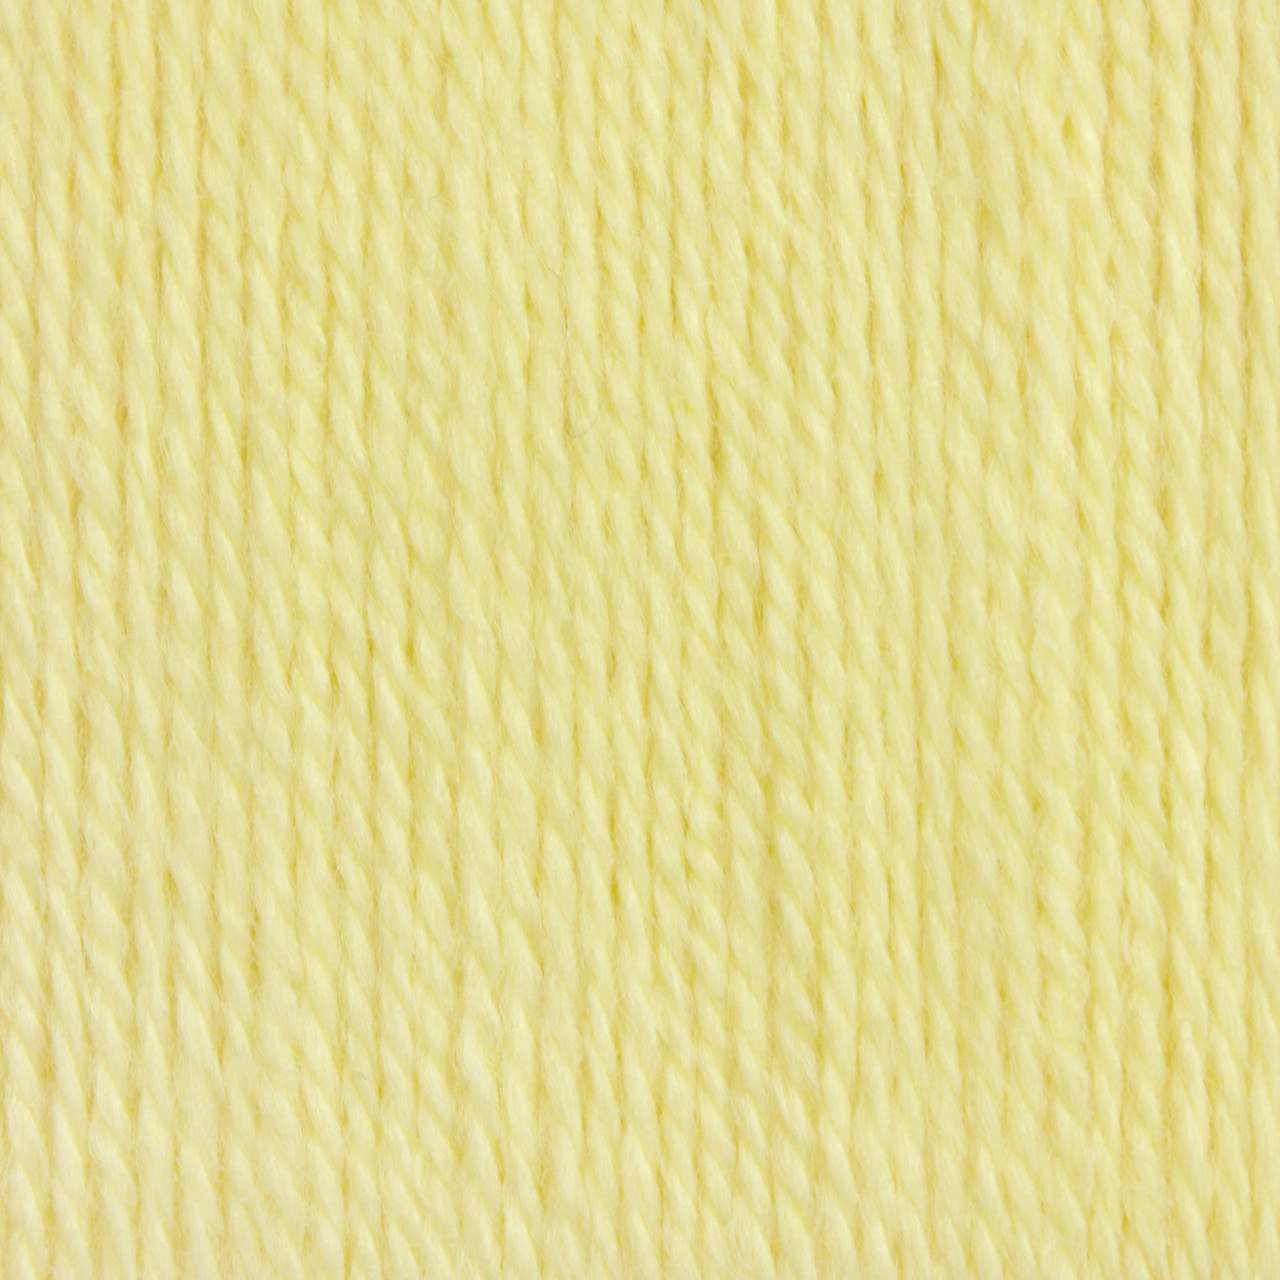 Bernat Yellow Baby Yarn 1 Super Fine Free Shipping At